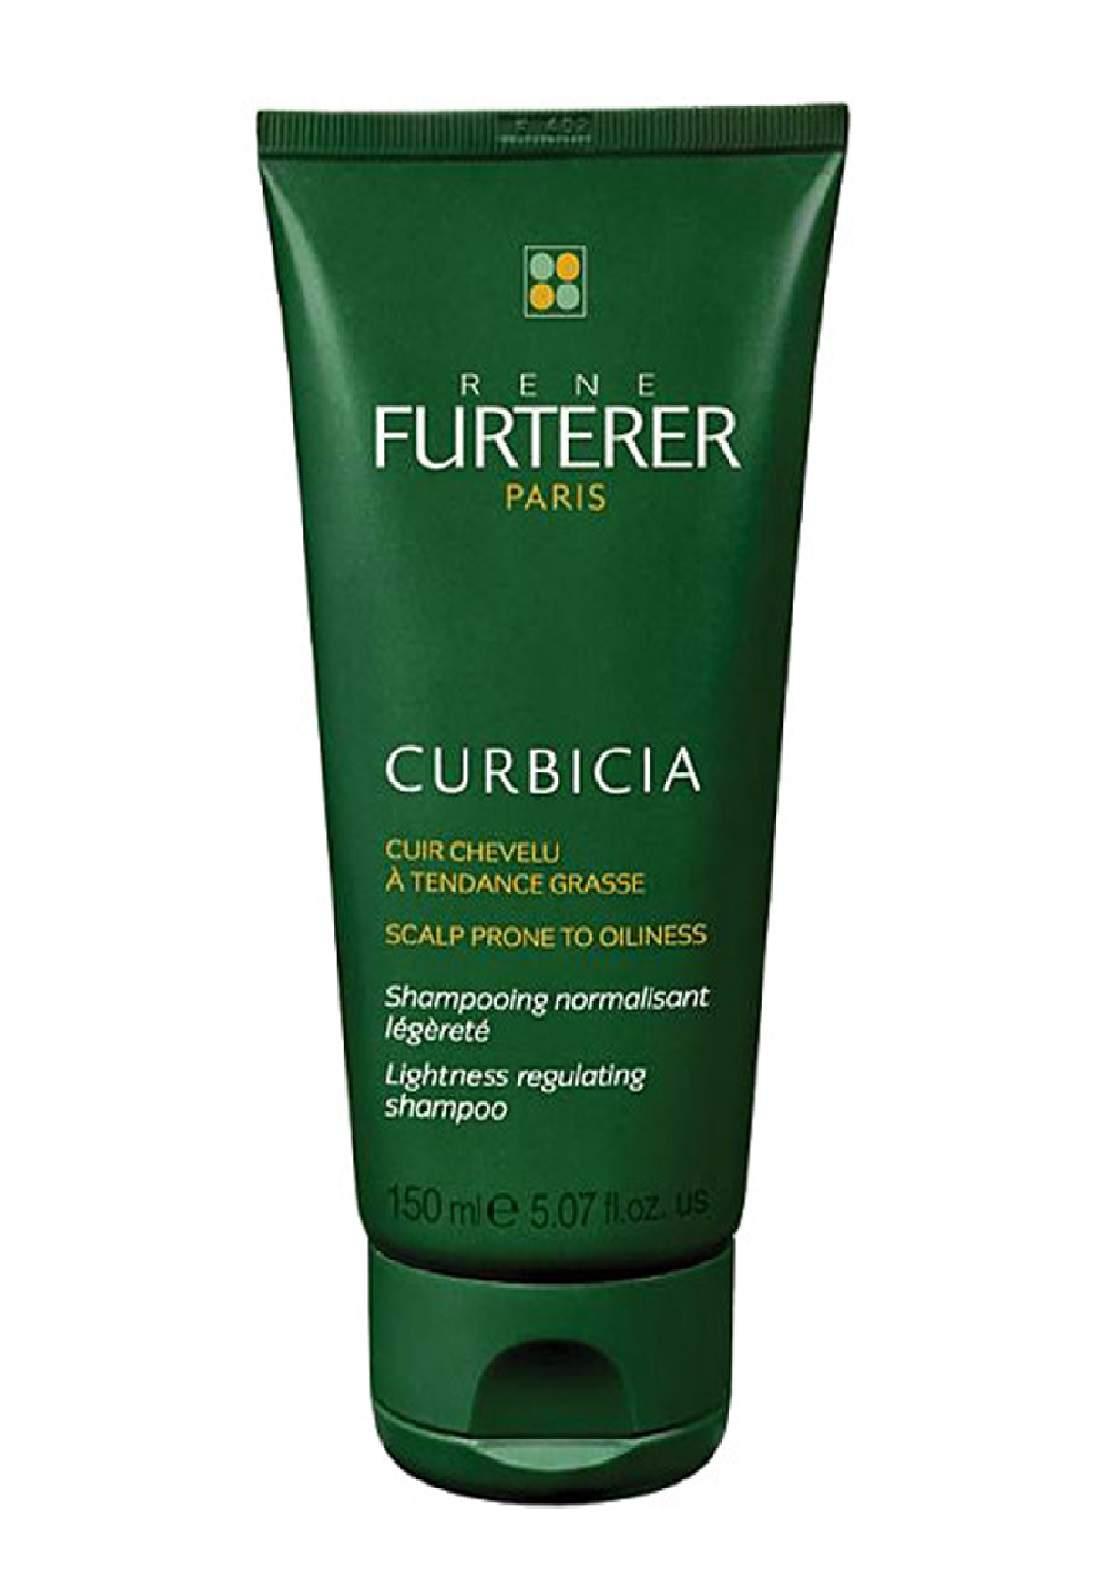 RENE FURTERER  SHAMPOO CURBICIA 200ML شامبو مخصص للفروه الدهنية